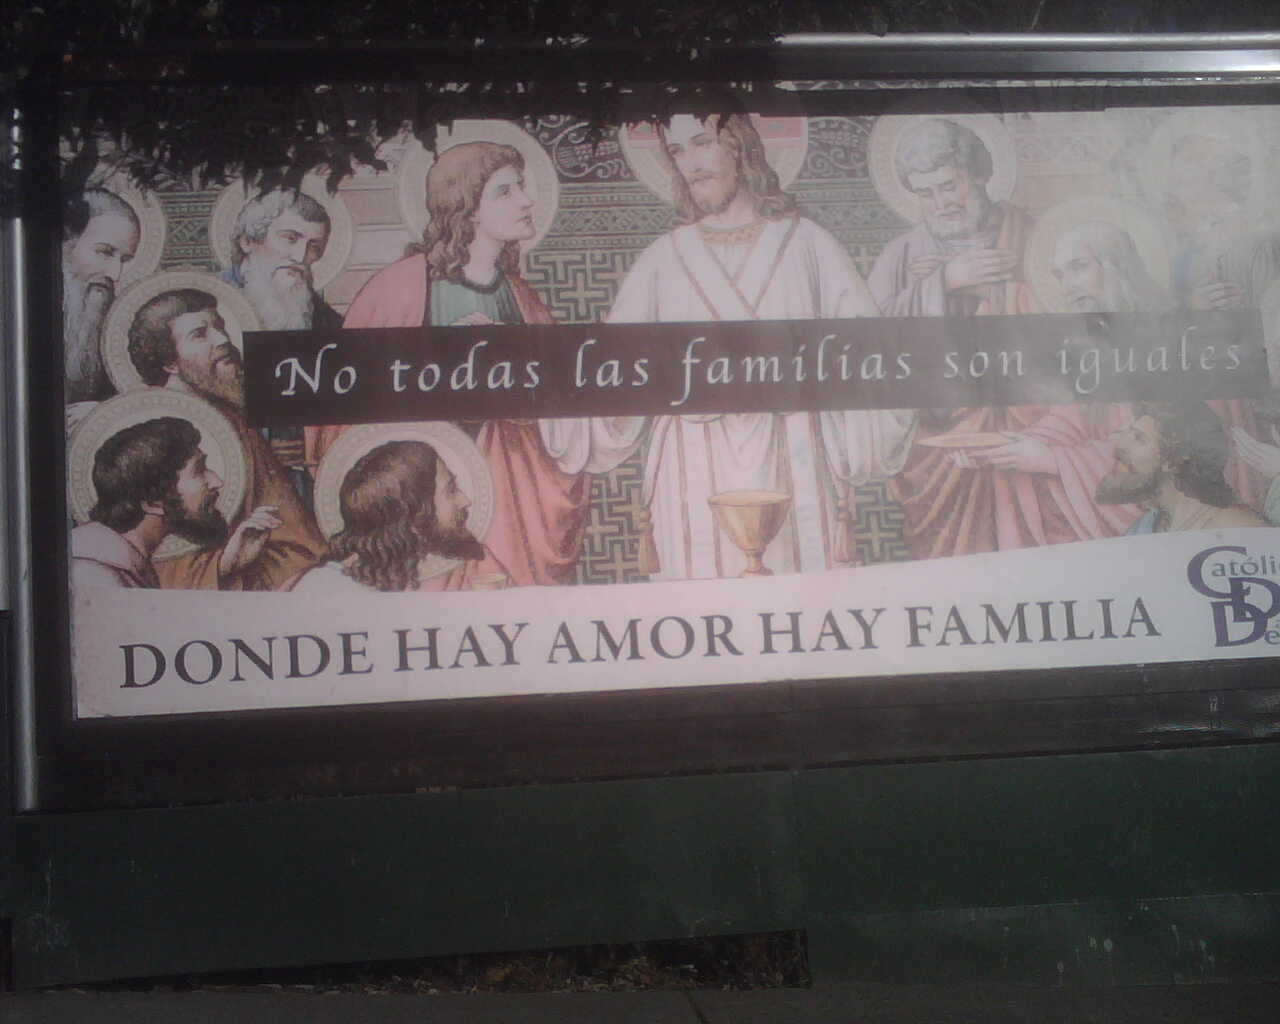 [Vaya+Familia]